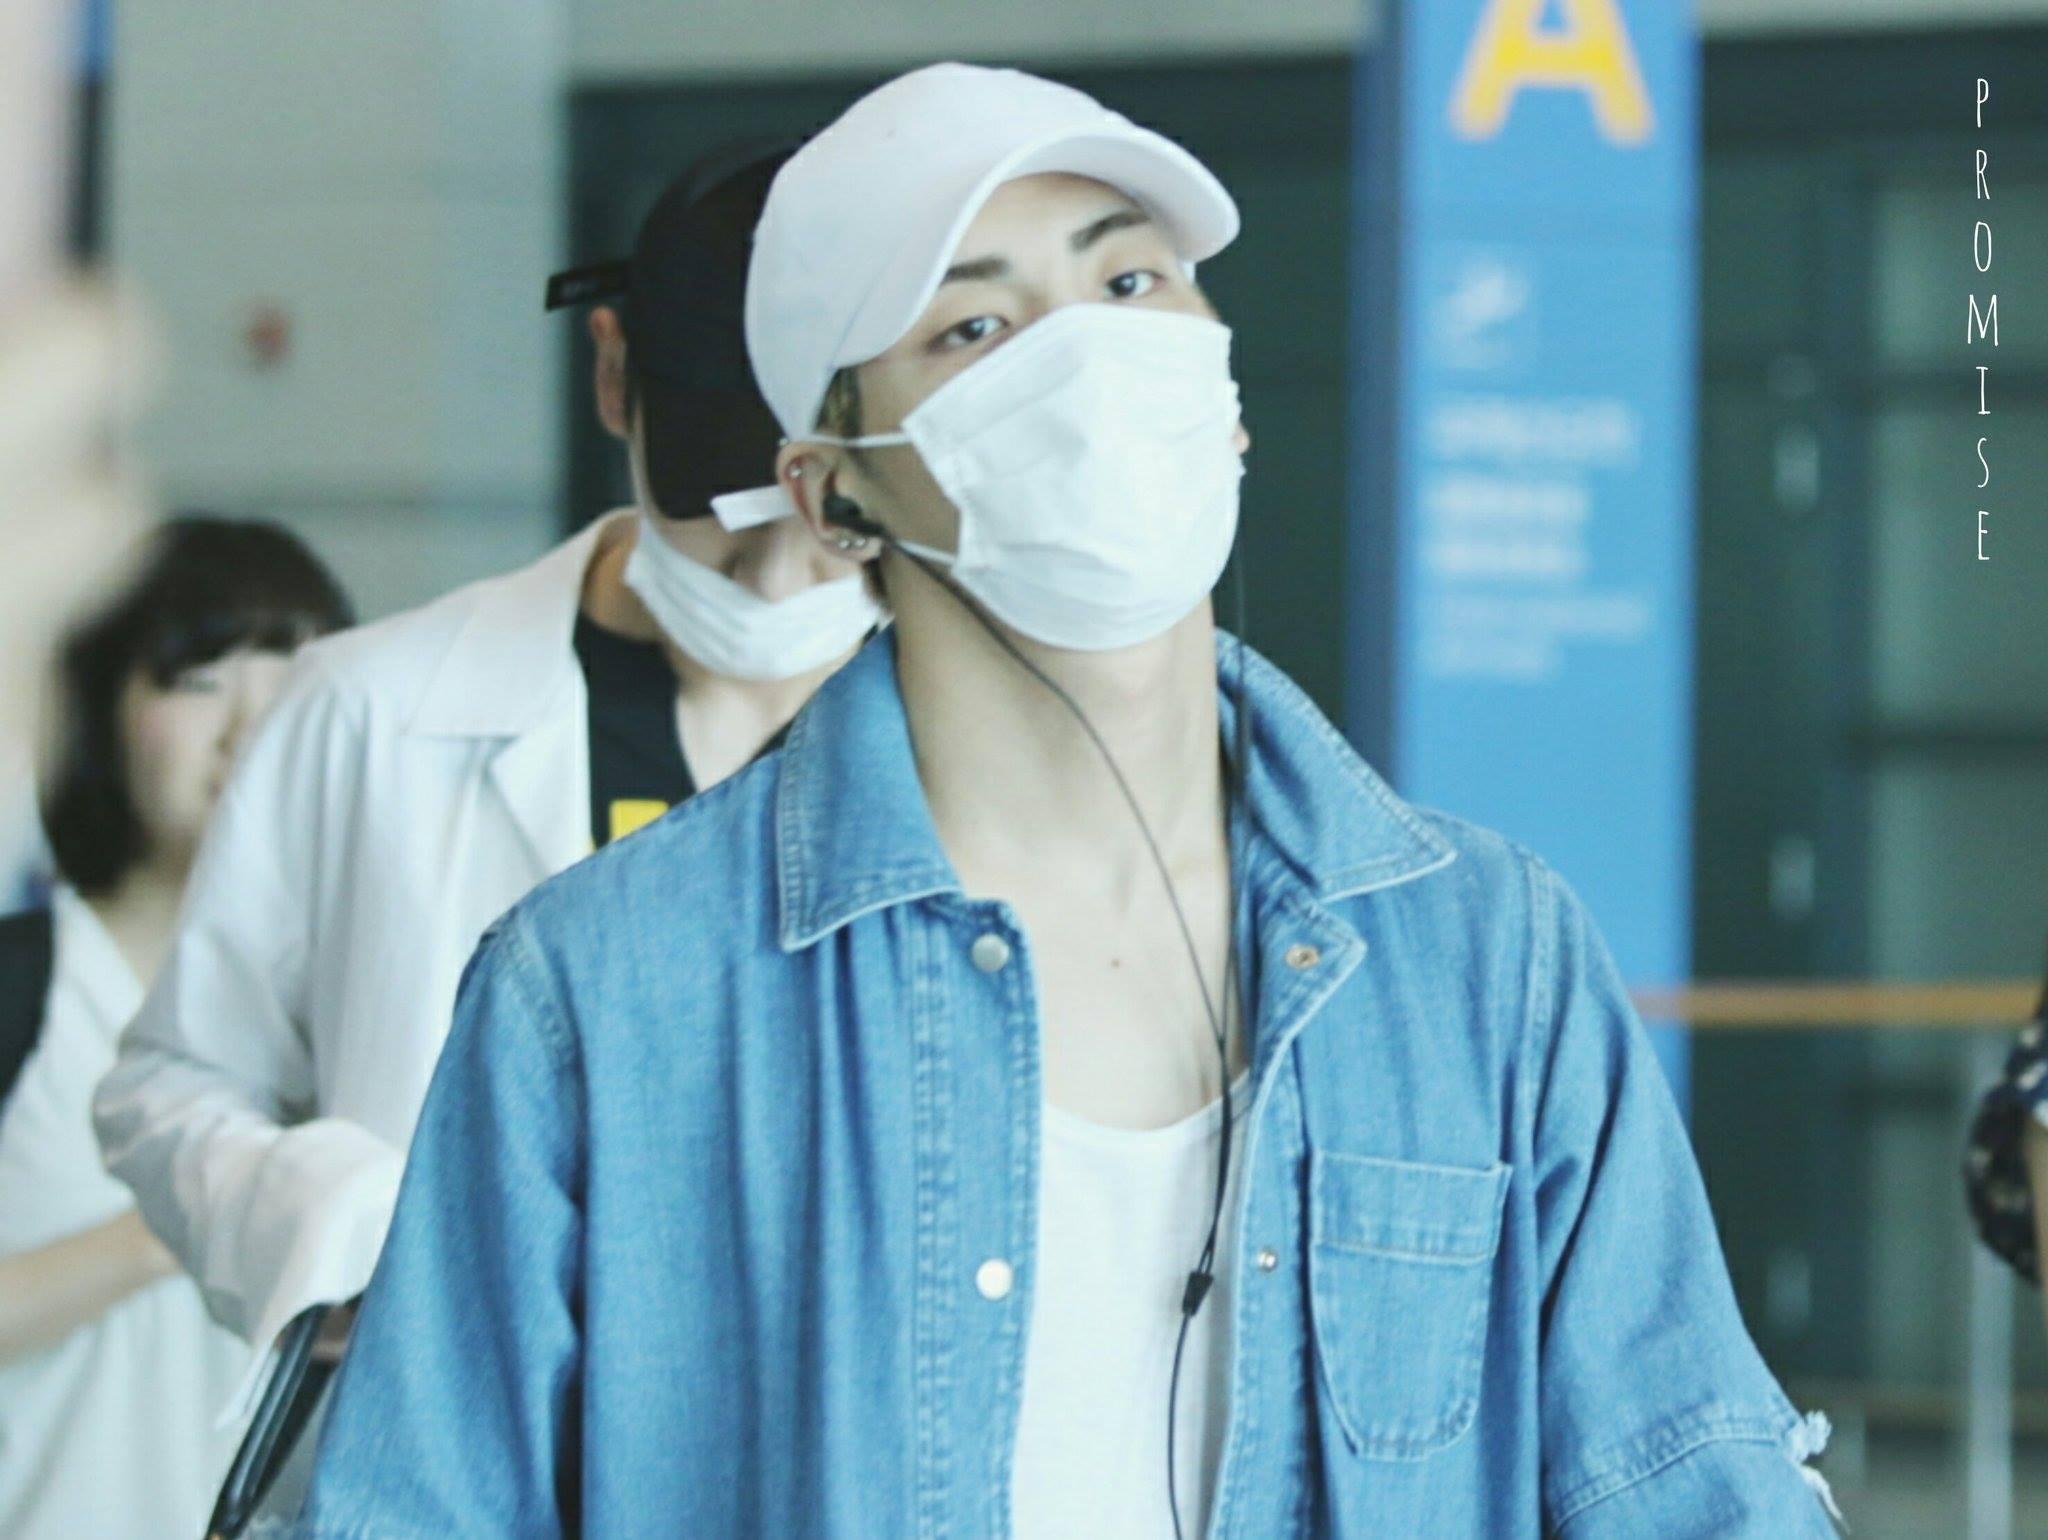 [IMG/160718] Onew, Jonghyun, Key, Minho @Aeropuerto de Kansai e Incheon (Jap-Cor) G5JnUjhZ